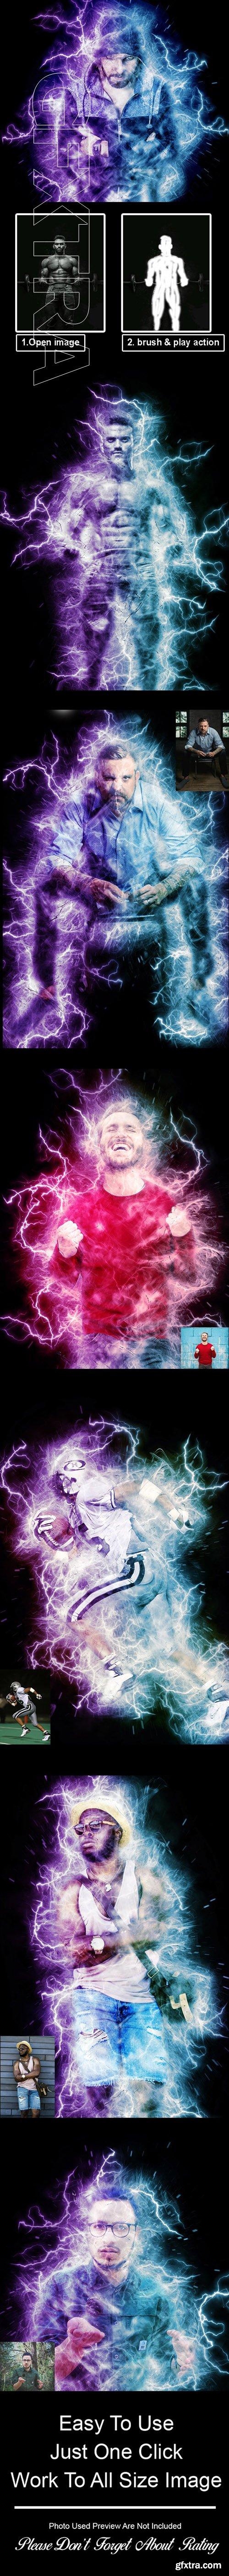 GraphicRiver - Power Photoshop Action Vol 2 23780871